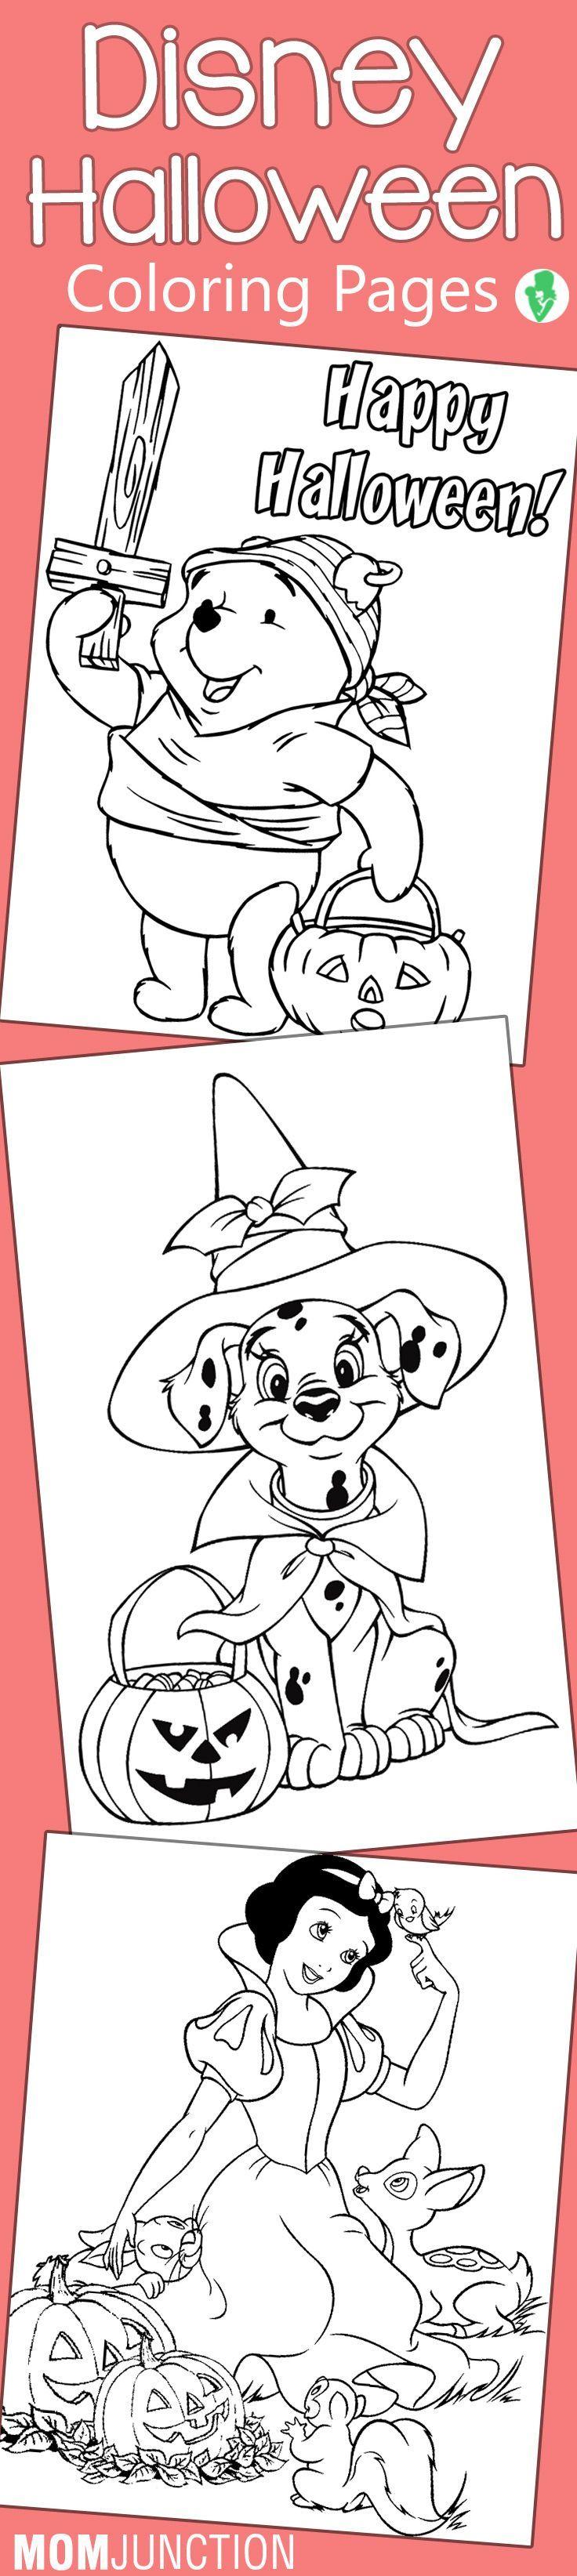 best 25 halloween coloring ideas only on pinterest halloween